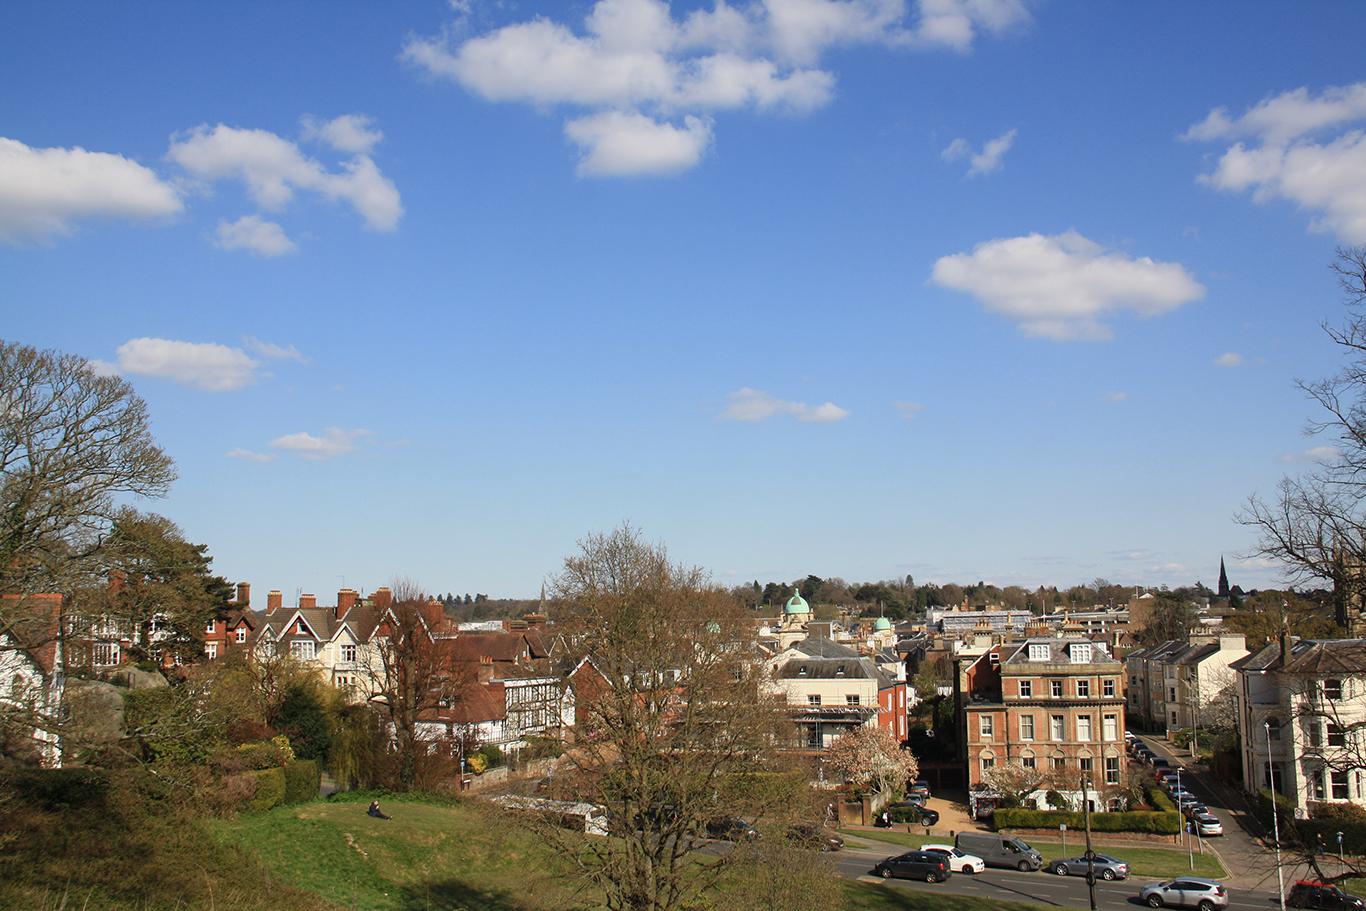 View of Royal Tunbridge Wells by Nicci Kimmel